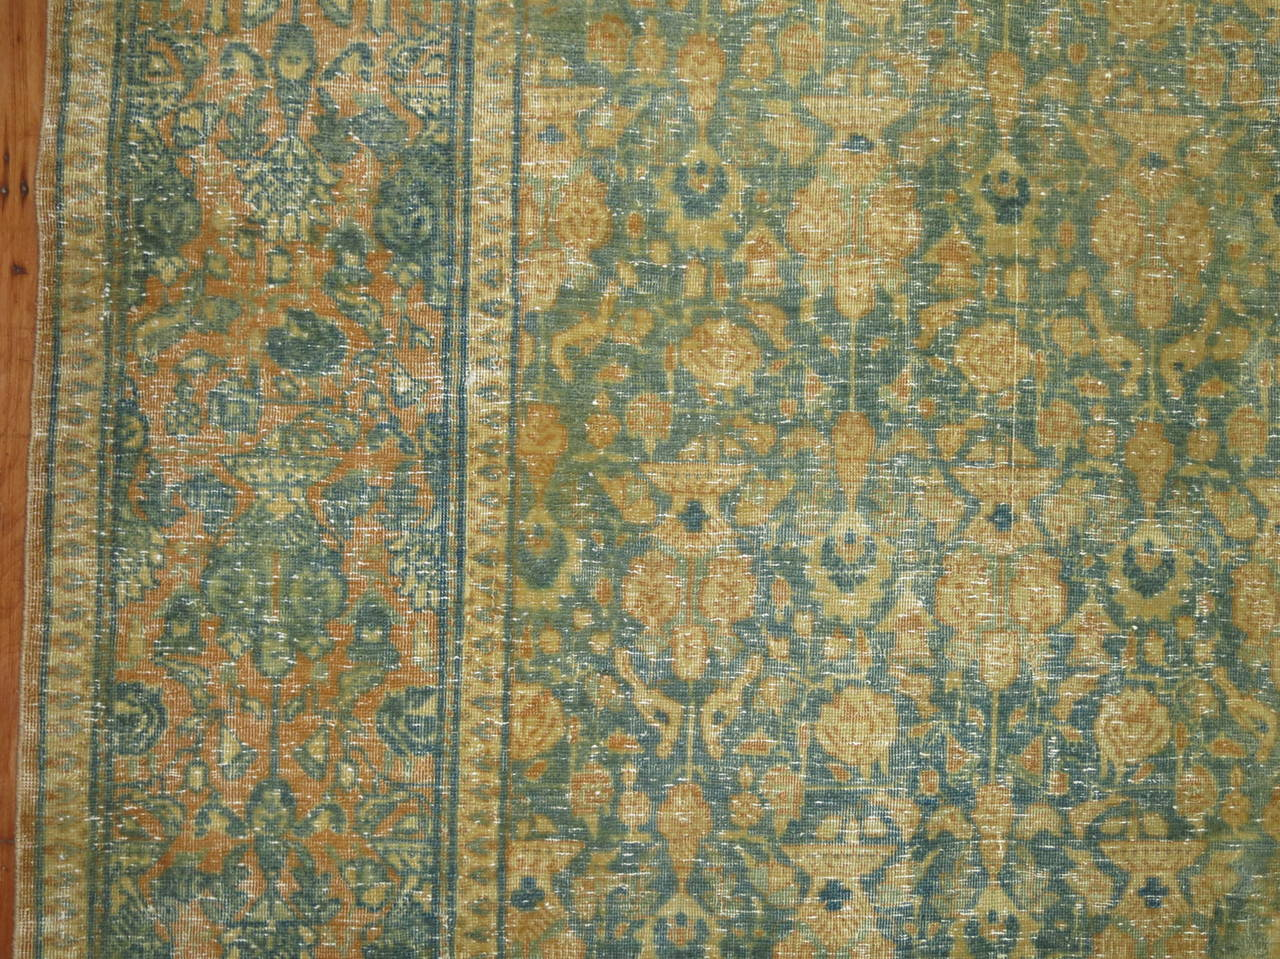 An early 20th century Persian Tabriz rug.